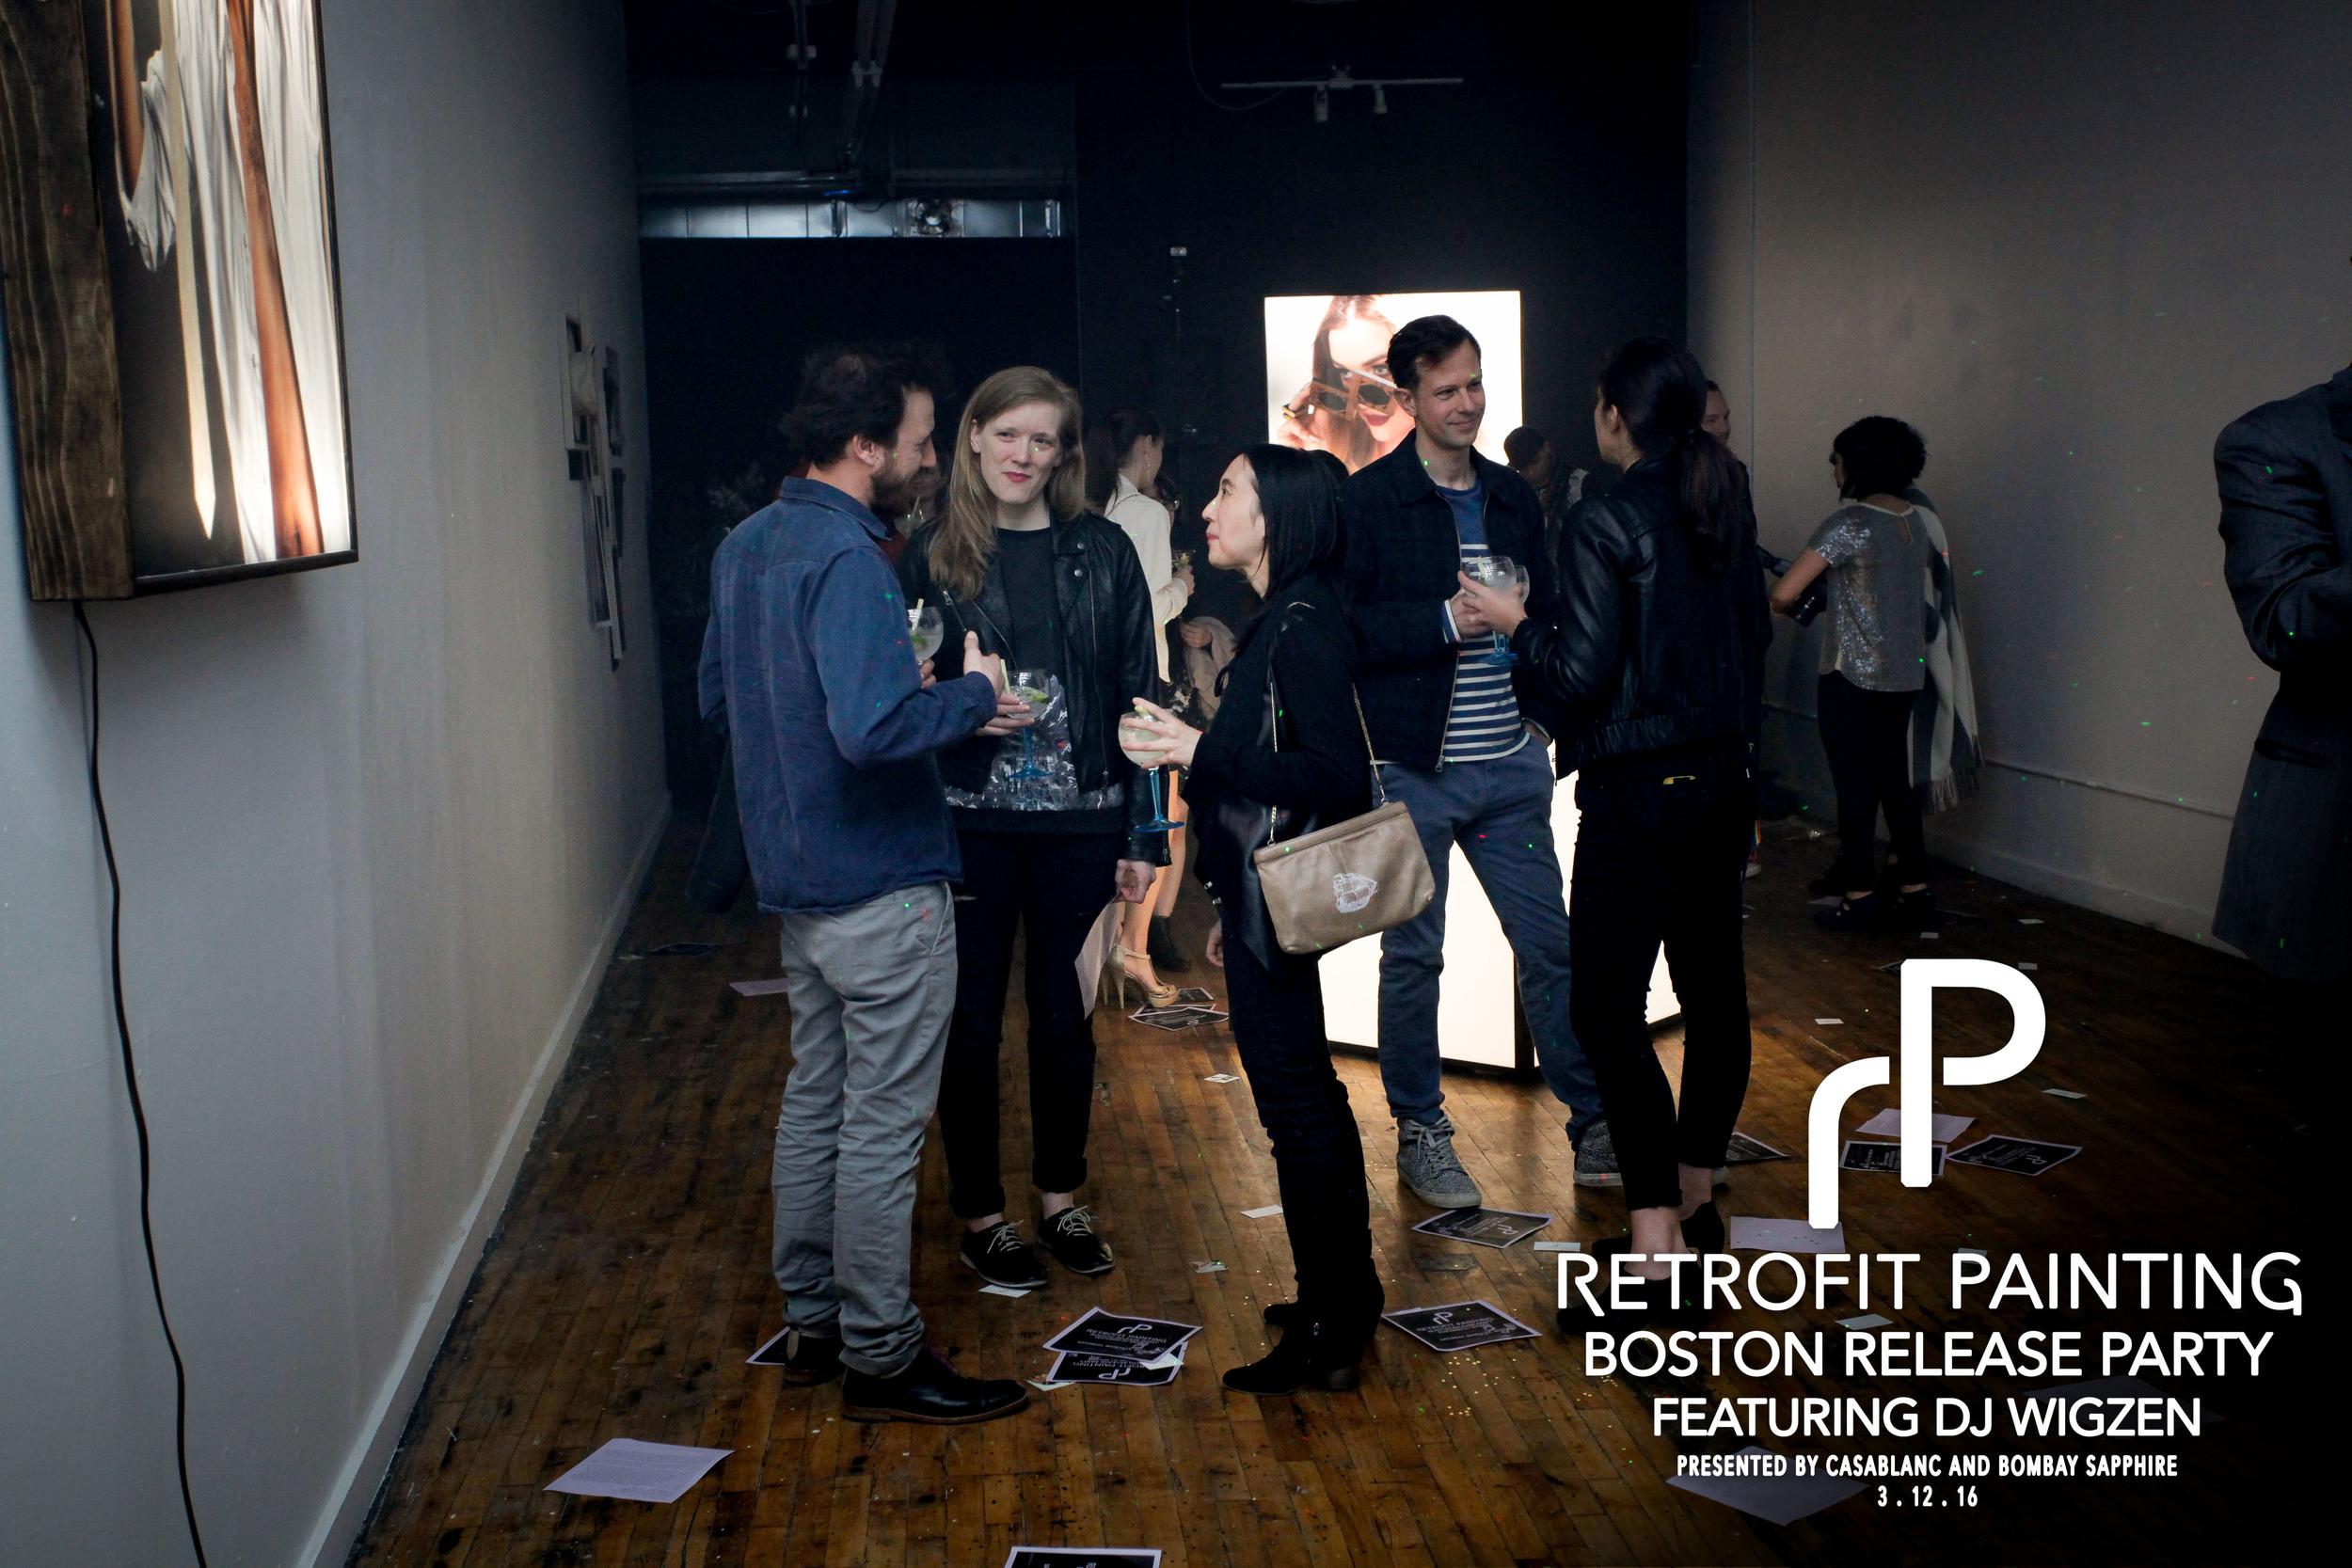 Retrofit Painting Boston Release Party 0050.jpg